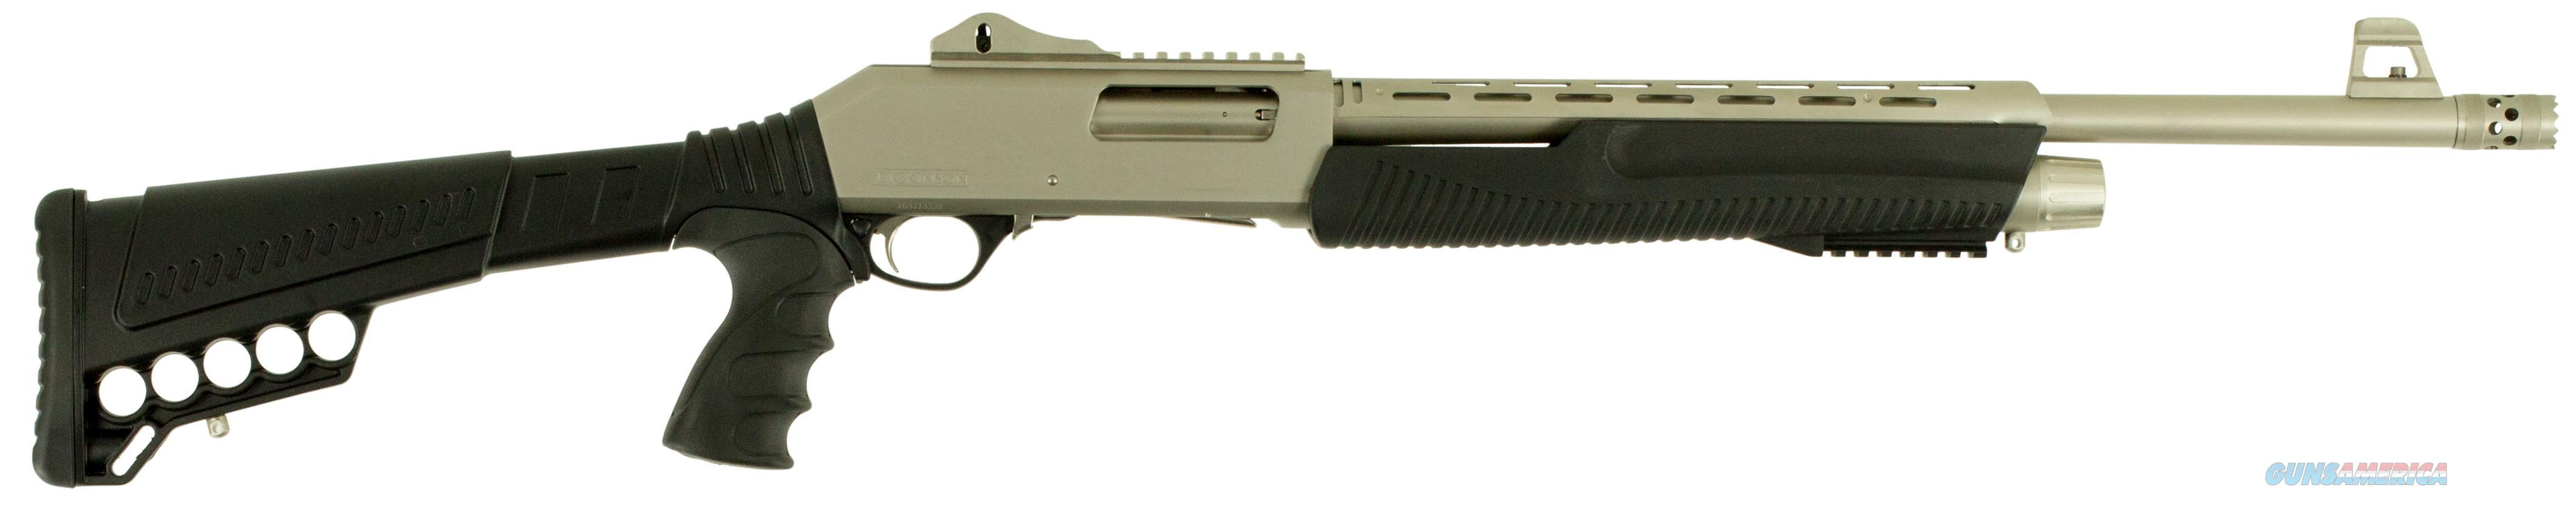 "Dickinson Xx3dm2 Defense Pump 12 Gauge 20"" 3"" 5+1 Synthetic Adjustable W/Pistol Grip Black Silver Marinecote XX3DM2  Guns > Shotguns > D Misc Shotguns"